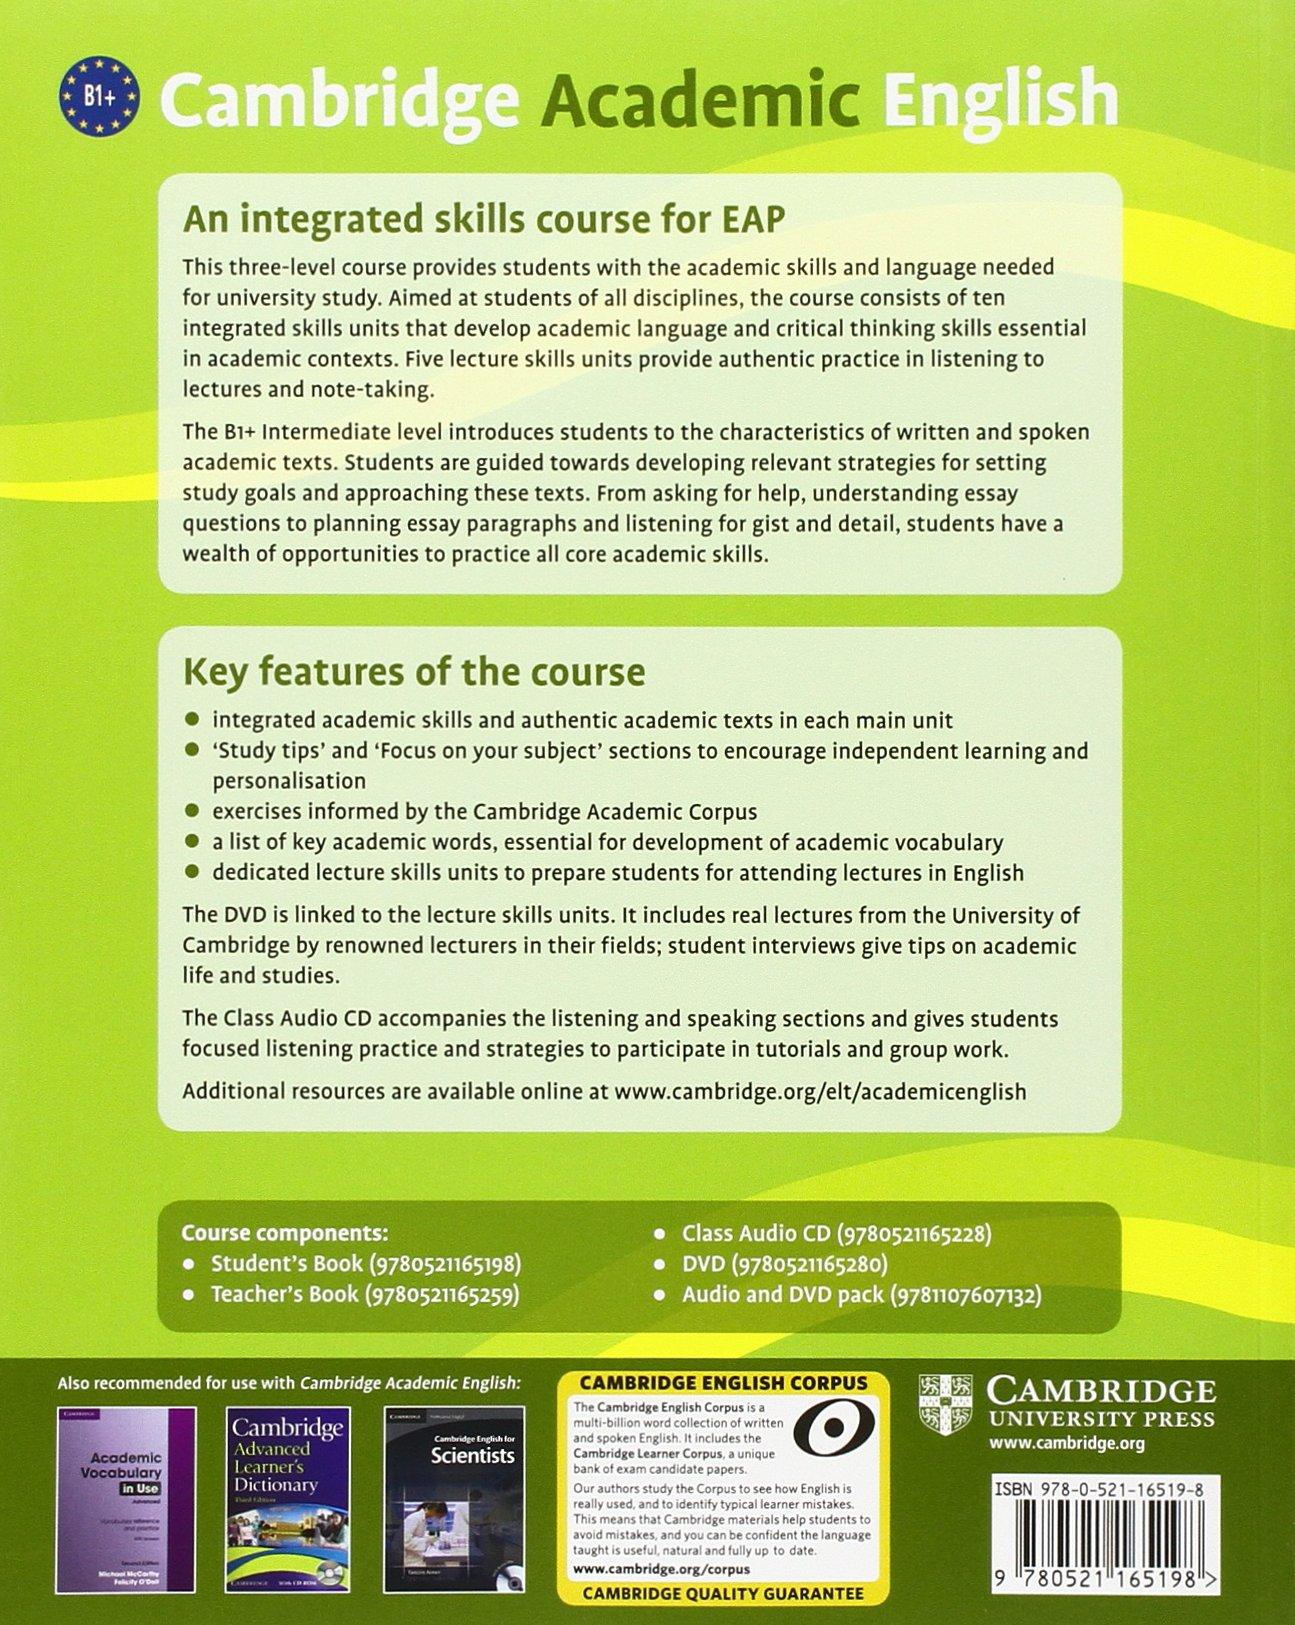 Cambridge academic english b1 intermediate students book an cambridge academic english b1 intermediate students book an integrated skills course for eap livros na amazon brasil 9780521165198 fandeluxe Images